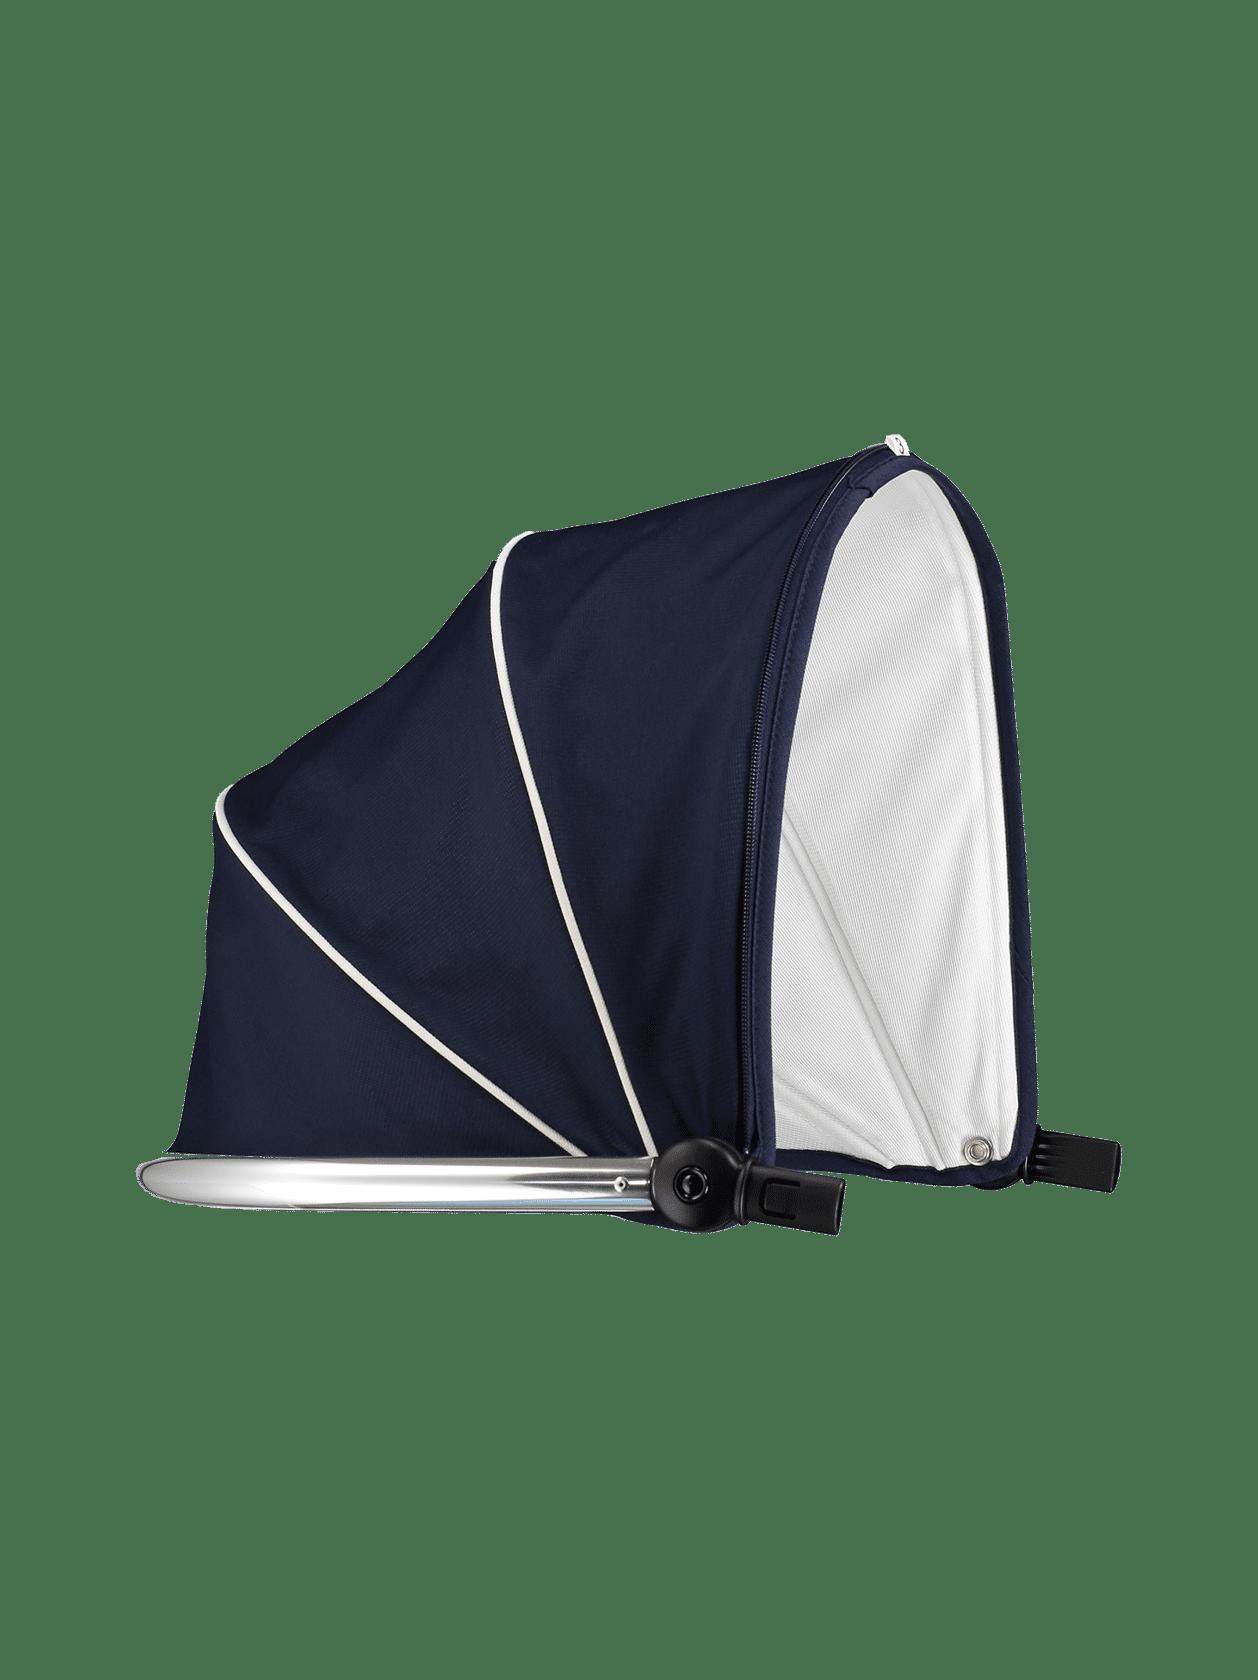 Peach Main Seat/Carrycot Hood